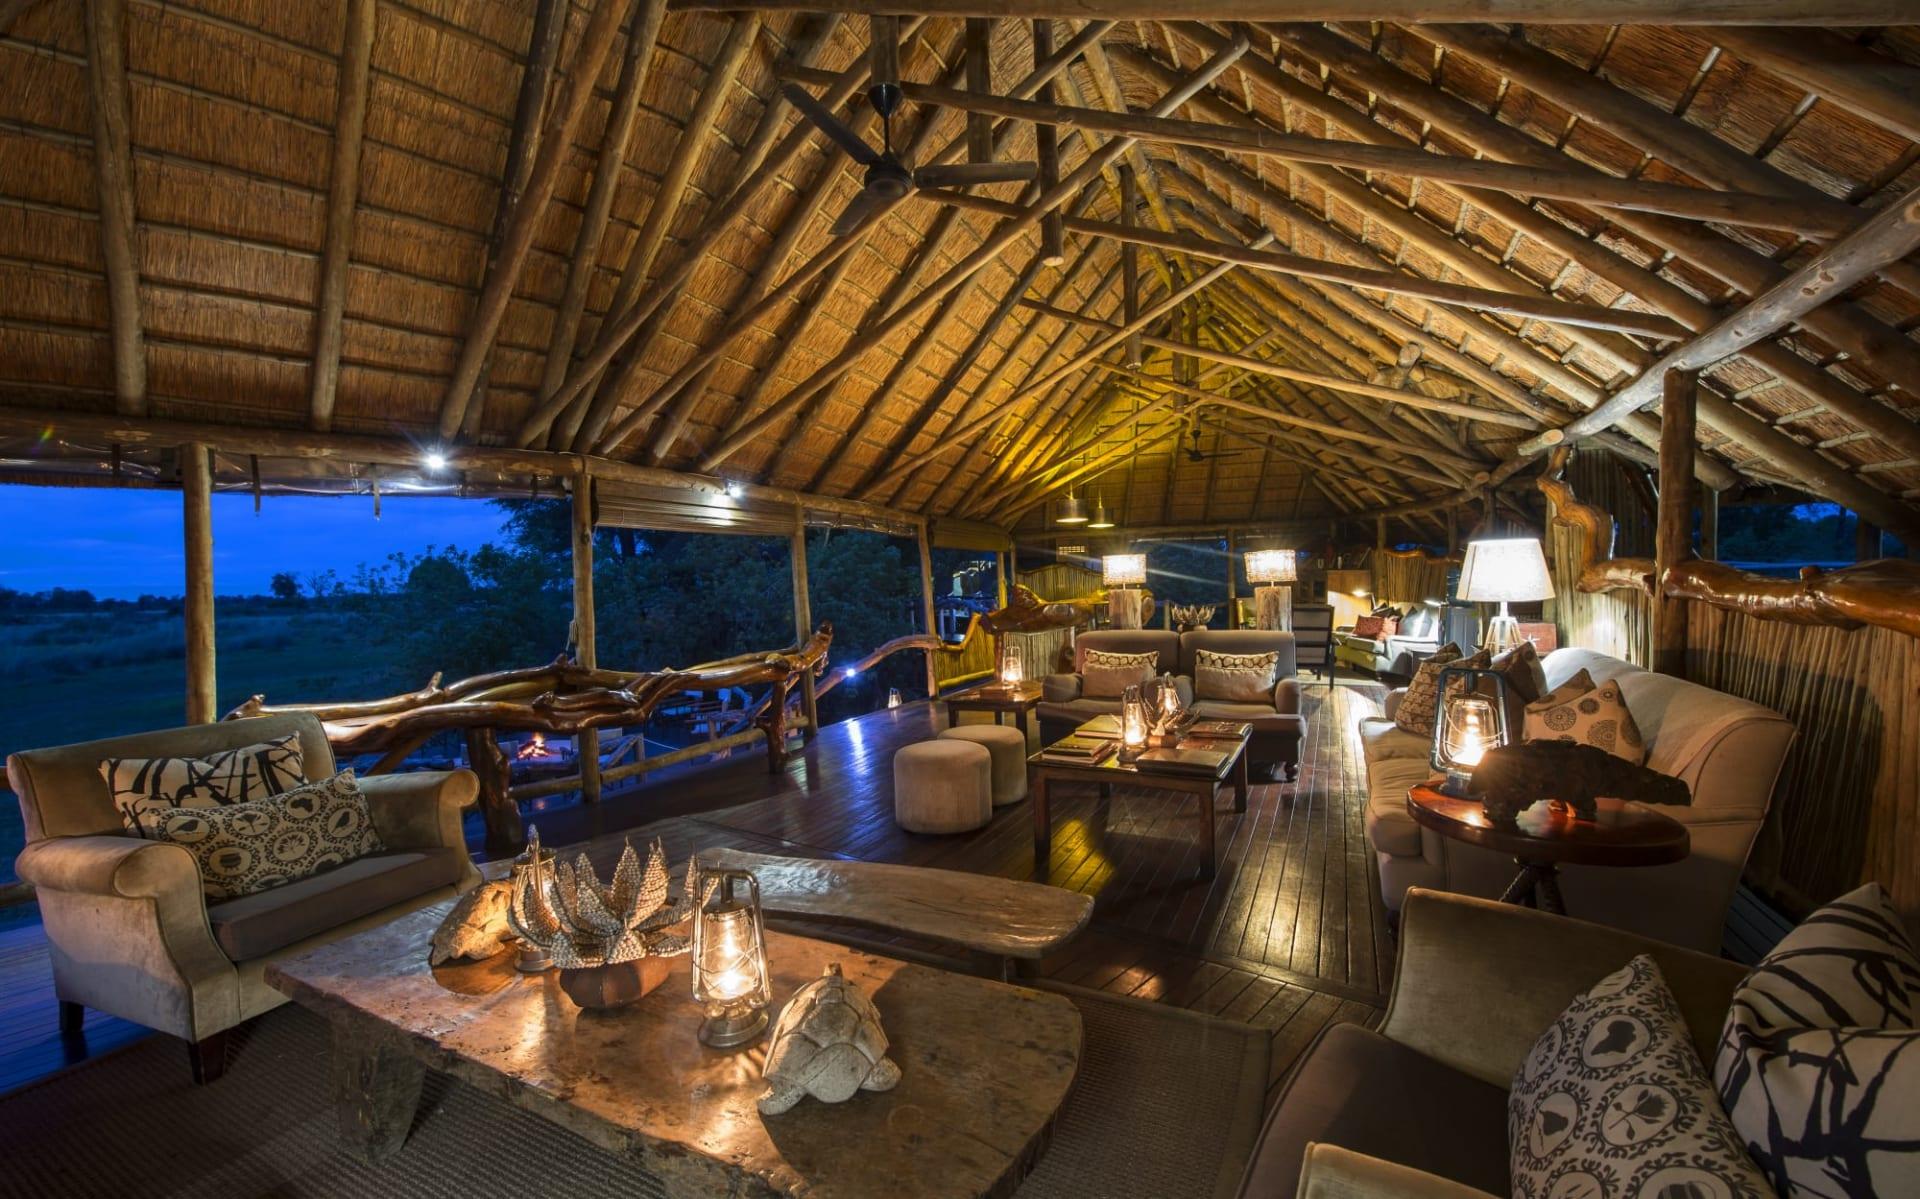 Chitabe Camp in Okavango Delta: Chitabe Camp